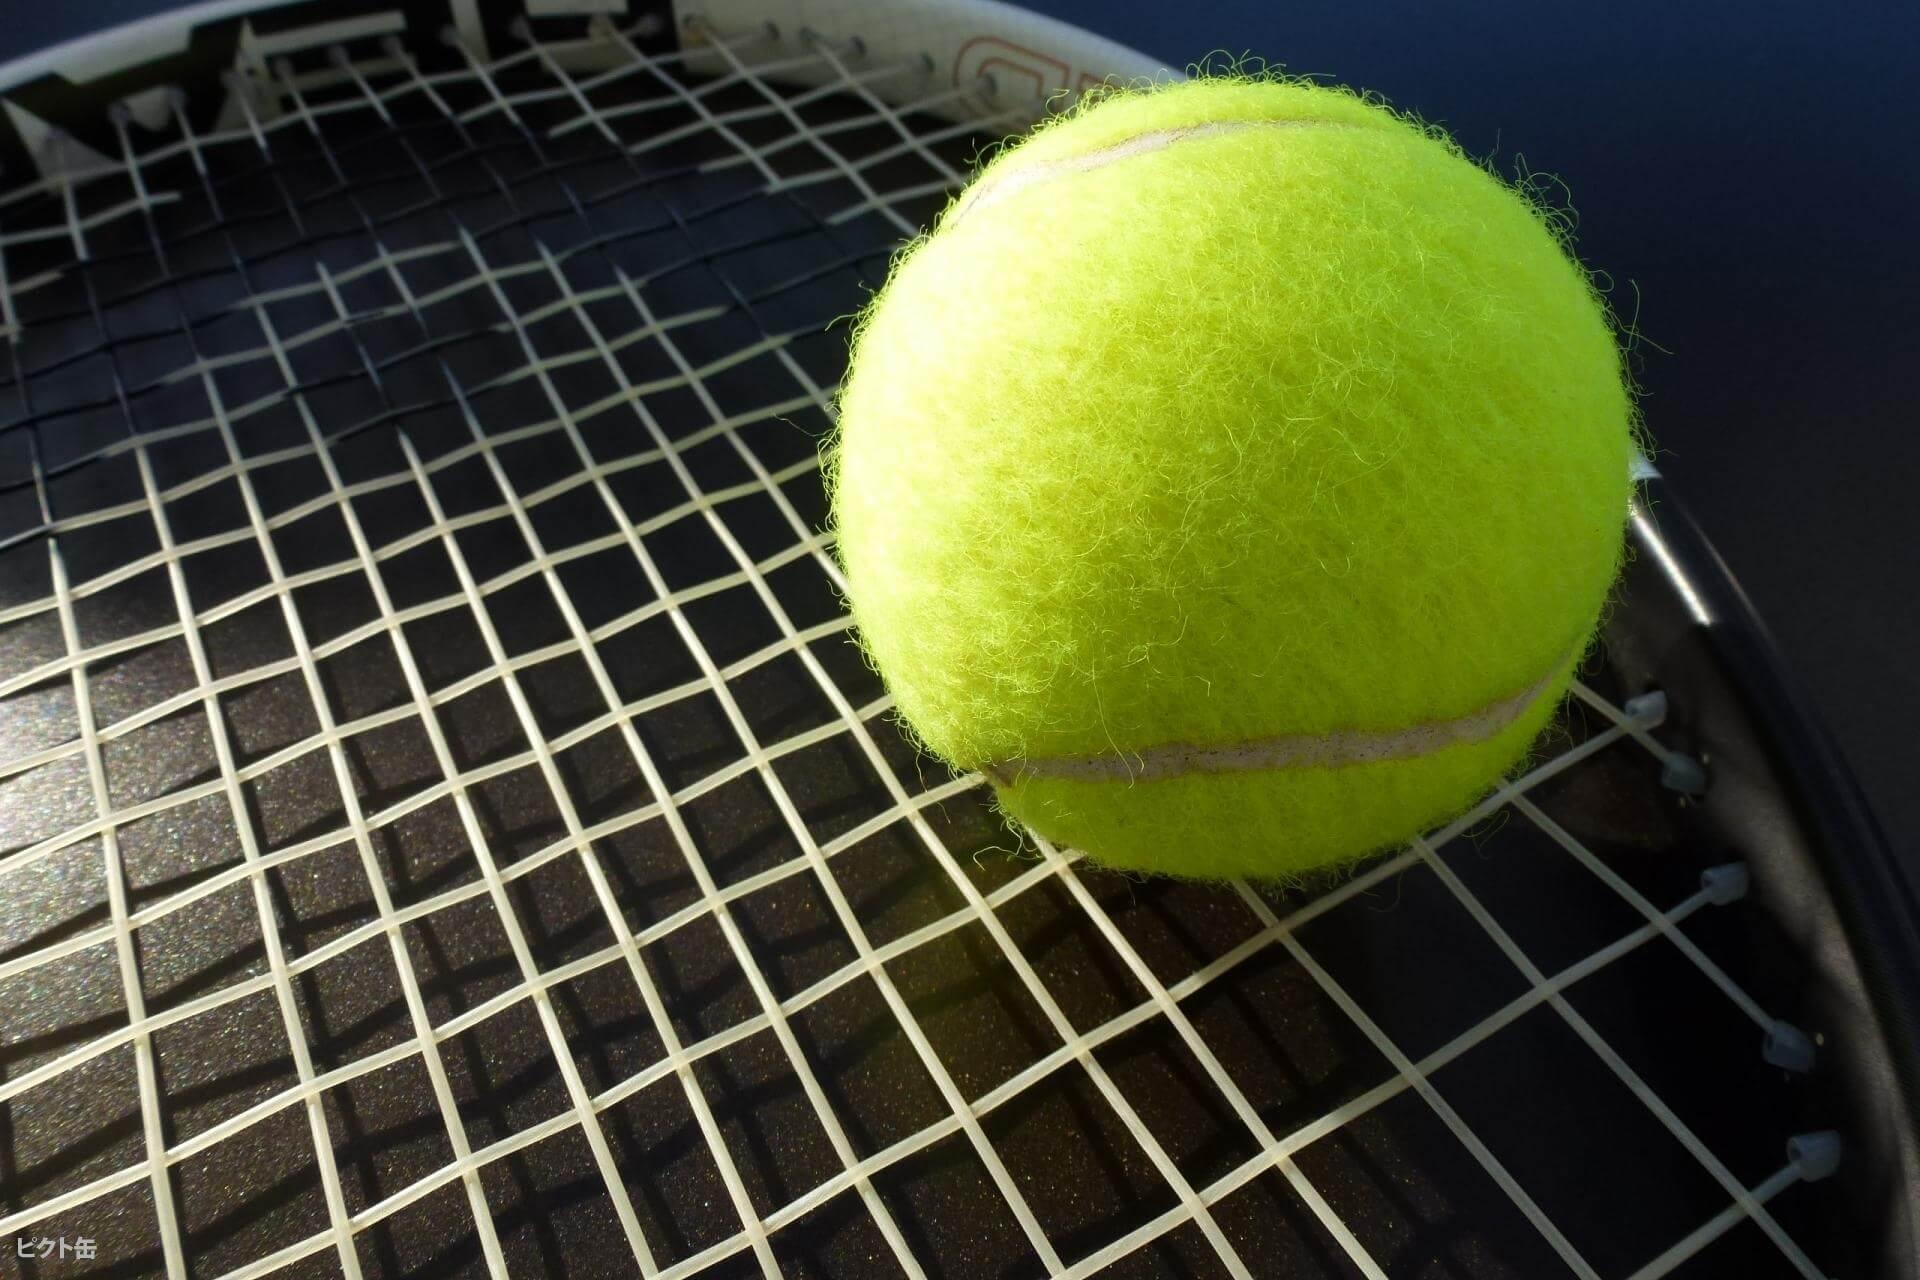 3761797742-tennis-363662-2R2K-1920x1280-MM-100